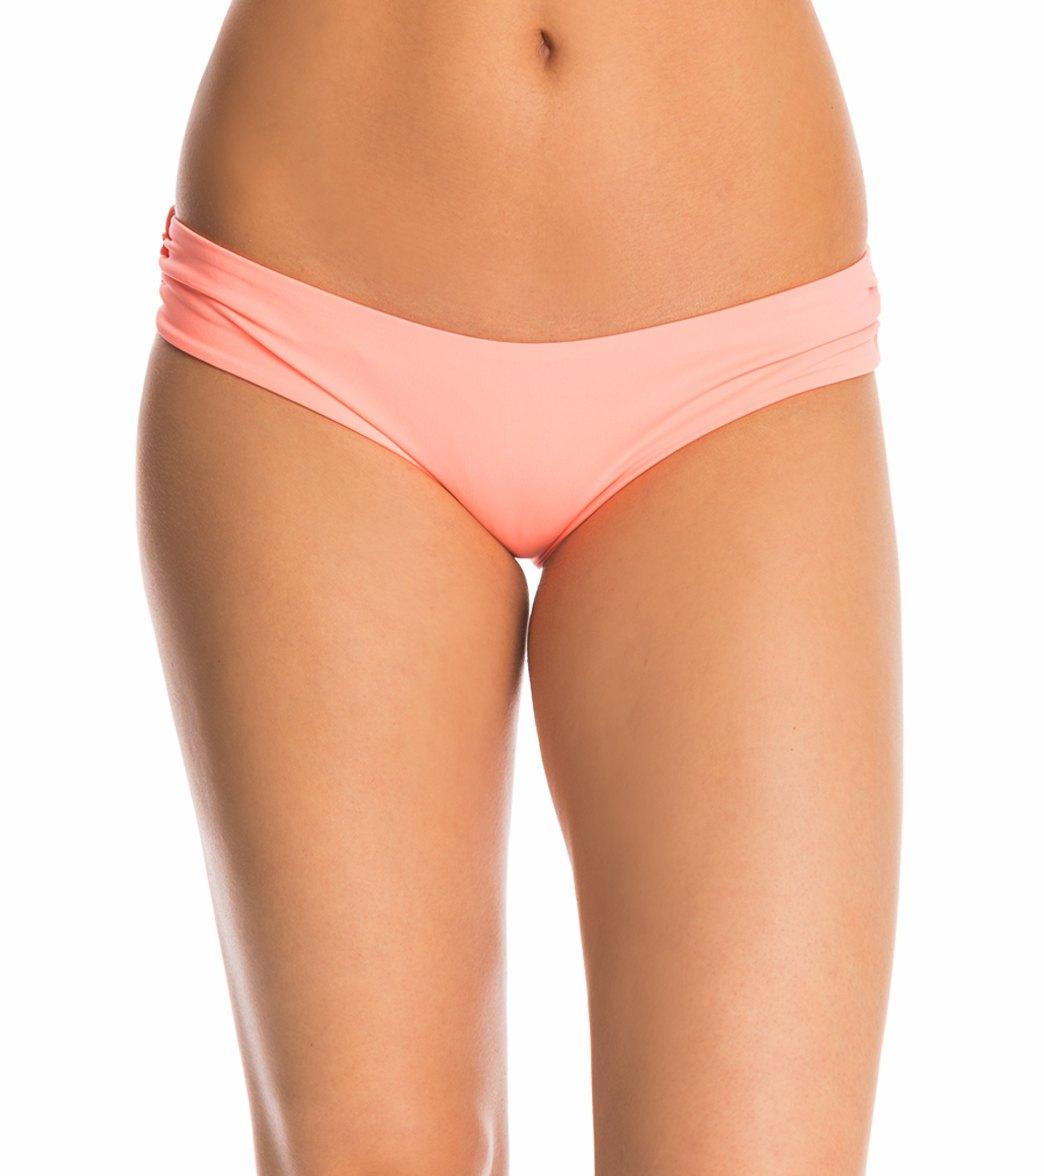 973751d8d4 Quintsoul Swimwear Solid Essentials Bella Bikini Bottom at SwimOutlet.com